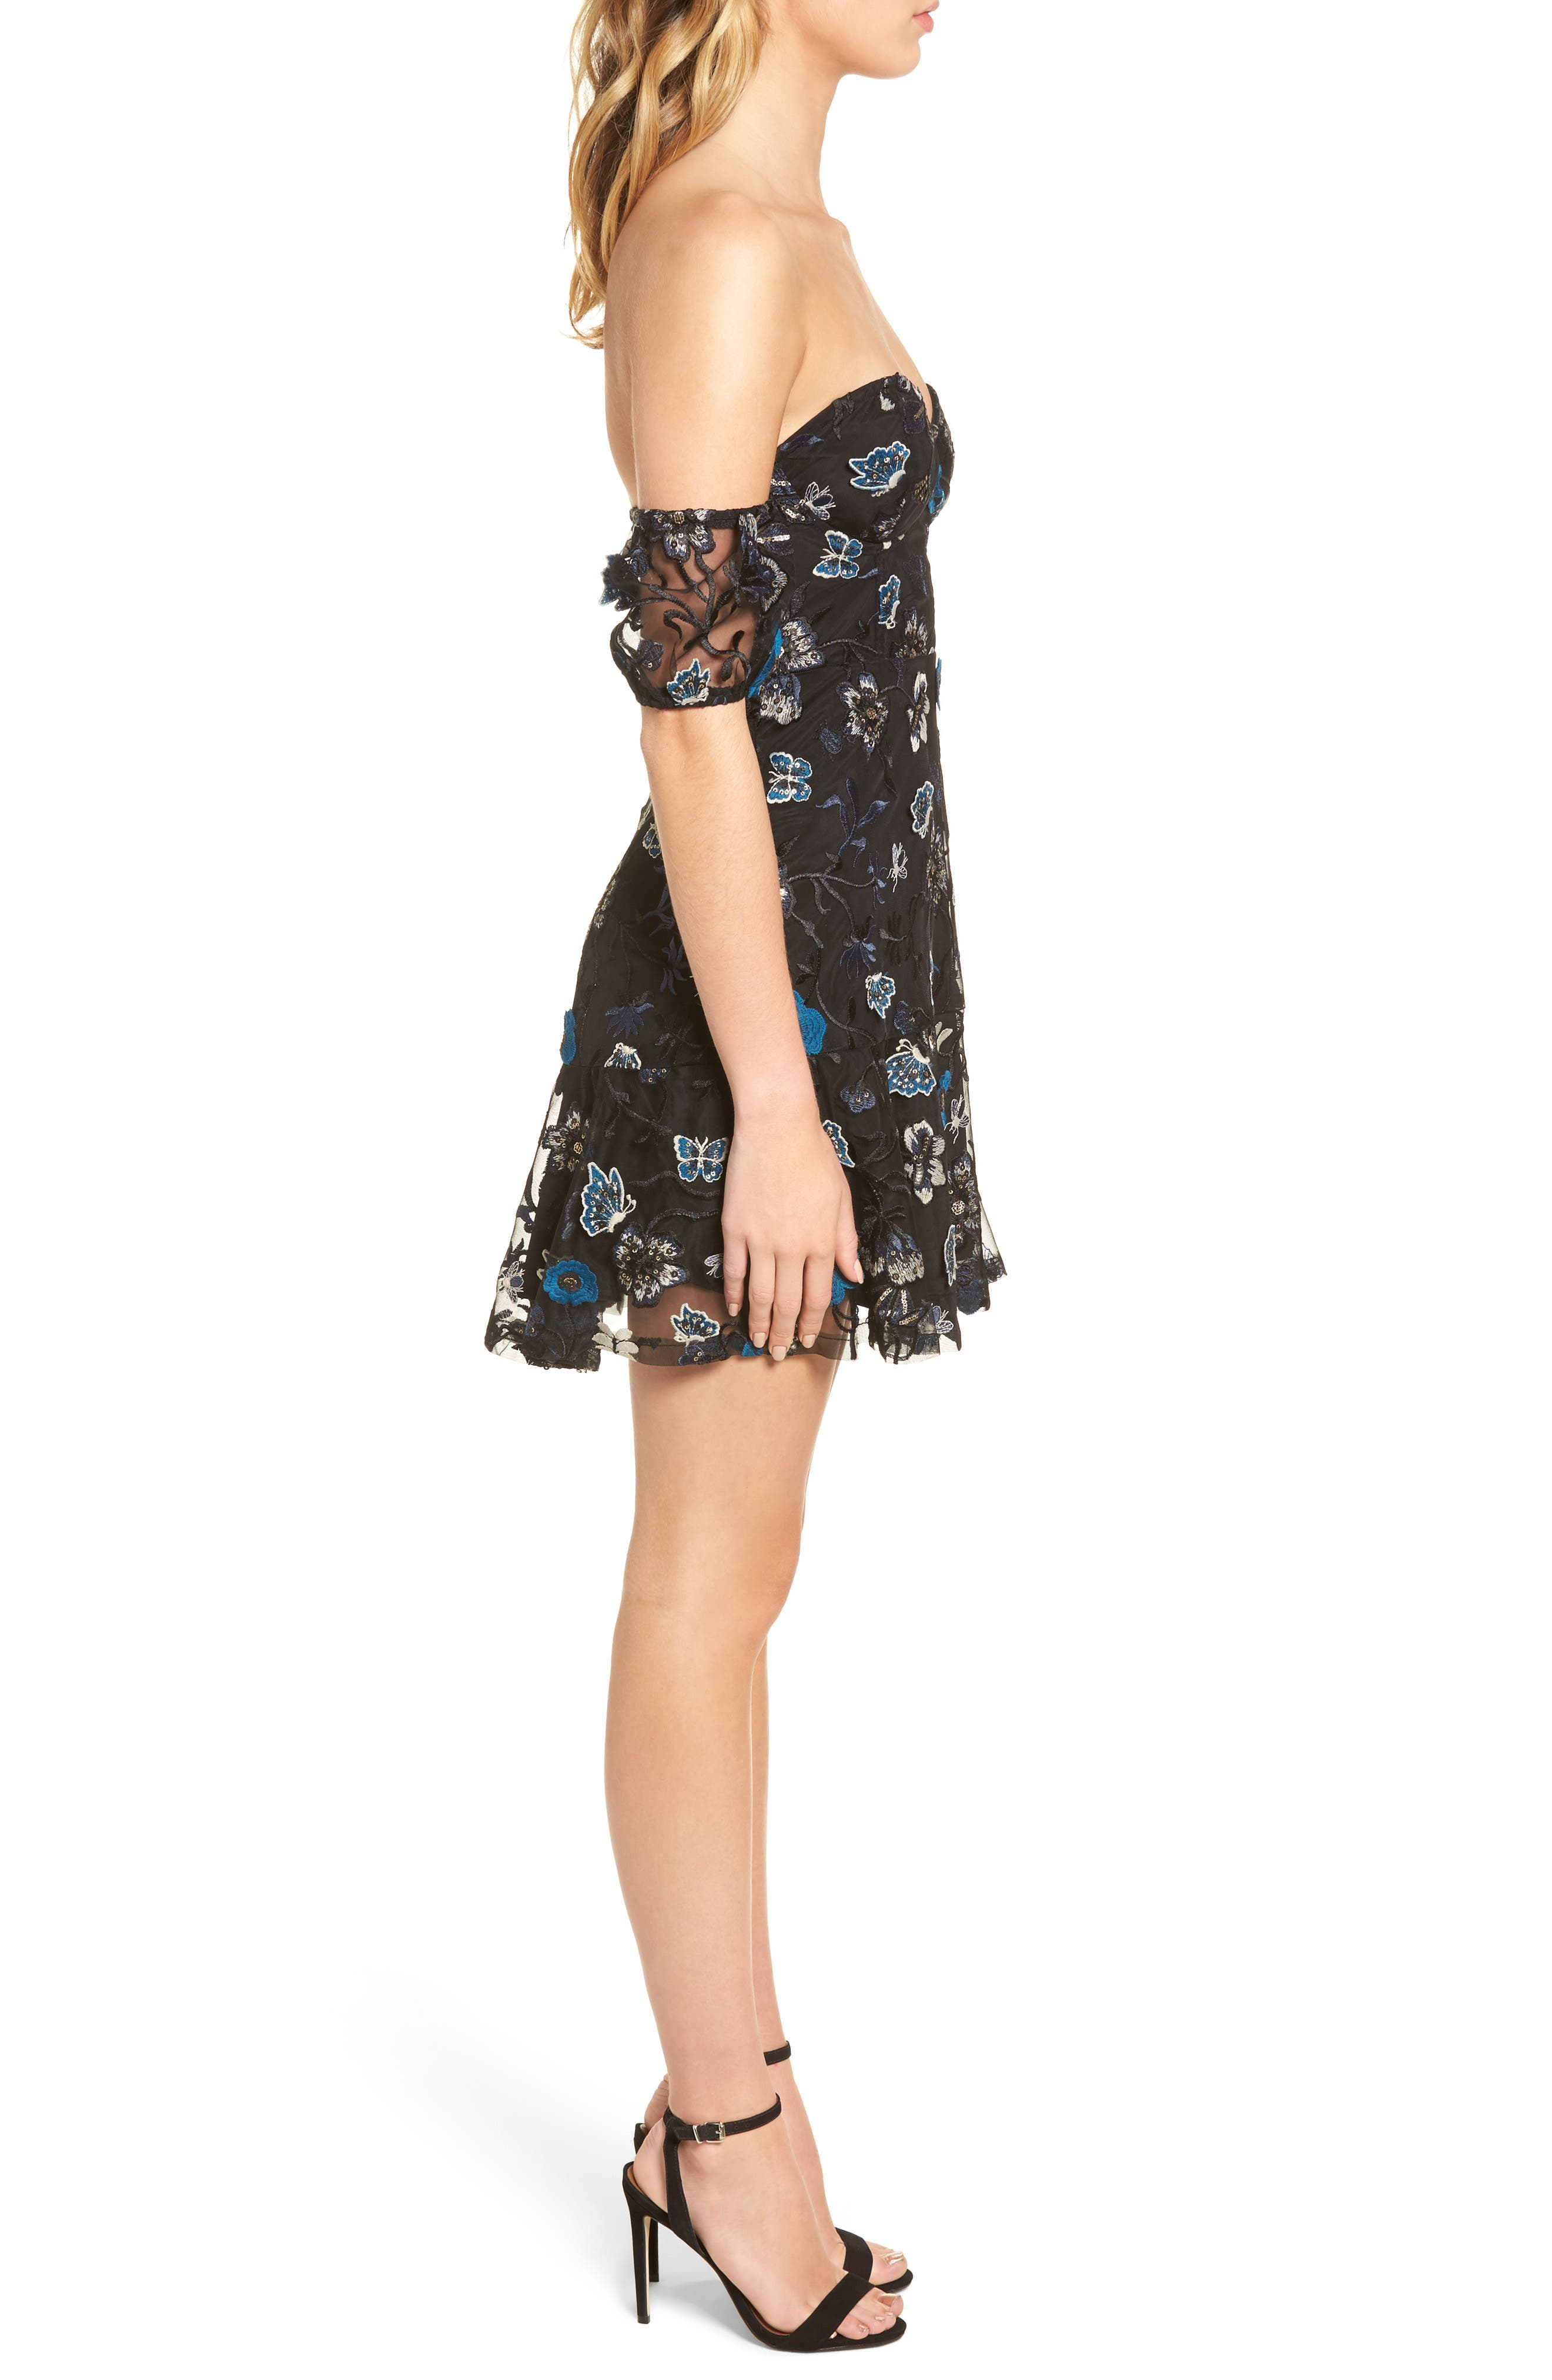 Bontanic Off the Shoulder Dress,                             Alternate thumbnail 3, color,                             Black Floral